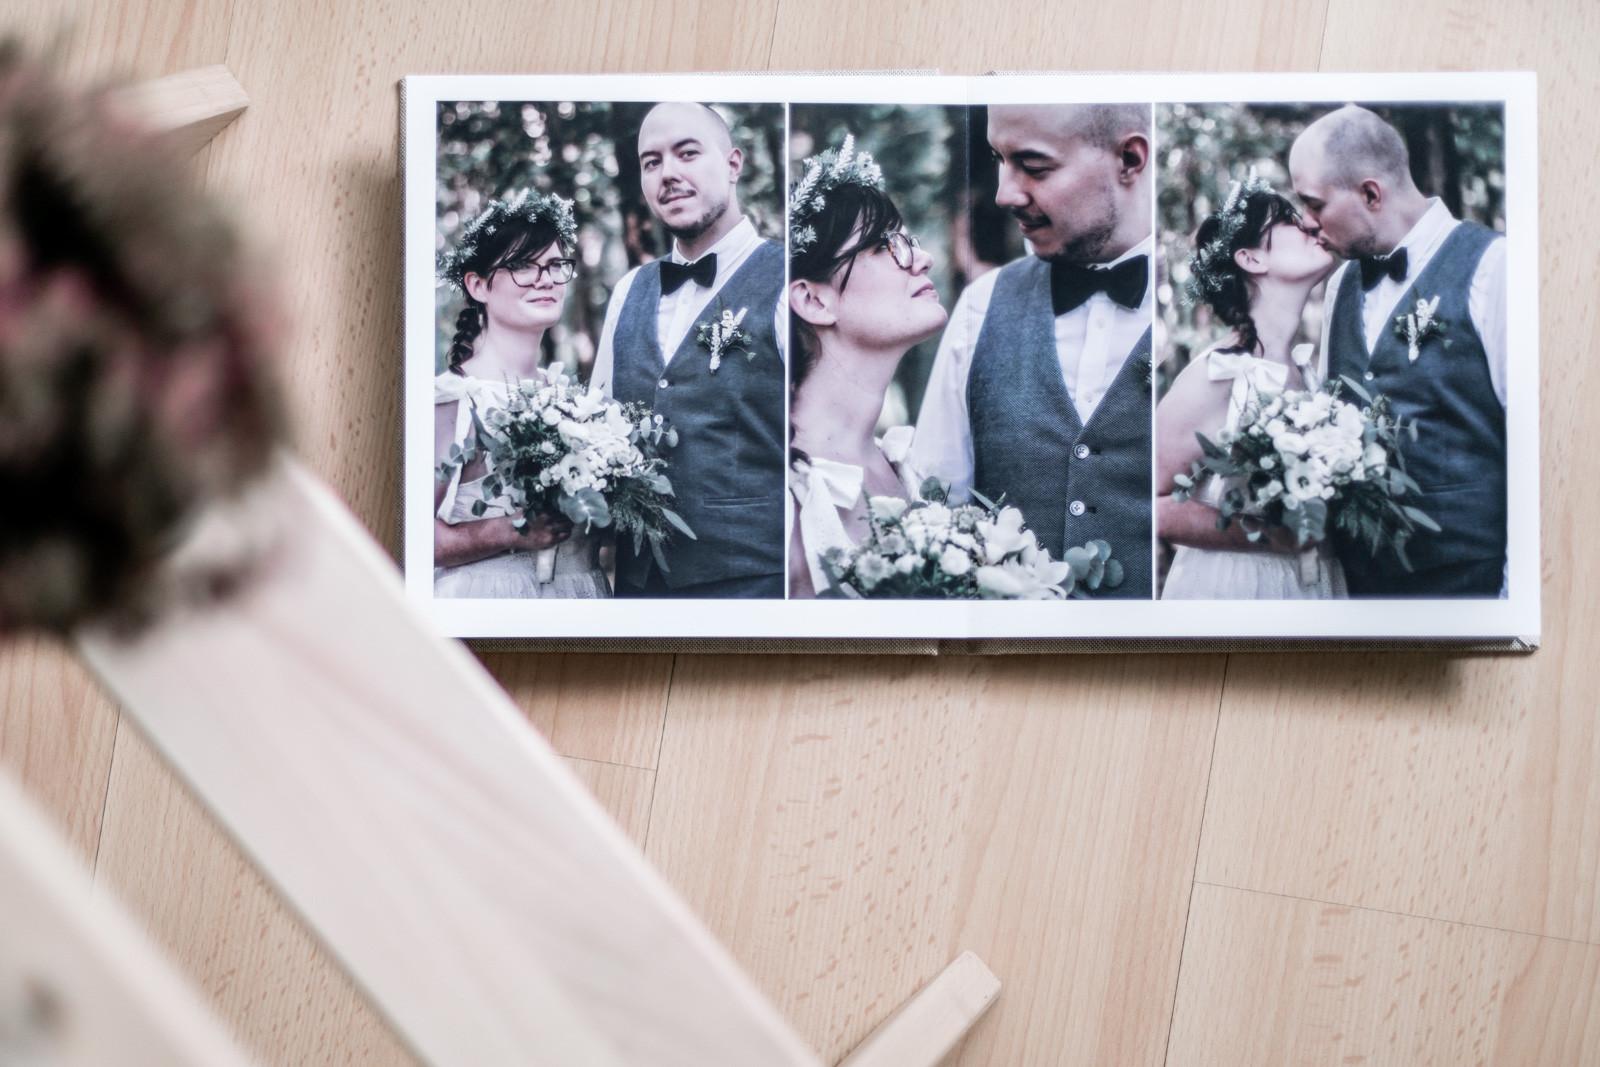 Darab_Zsuzsa_XYZ_weddings_book_003.jpg